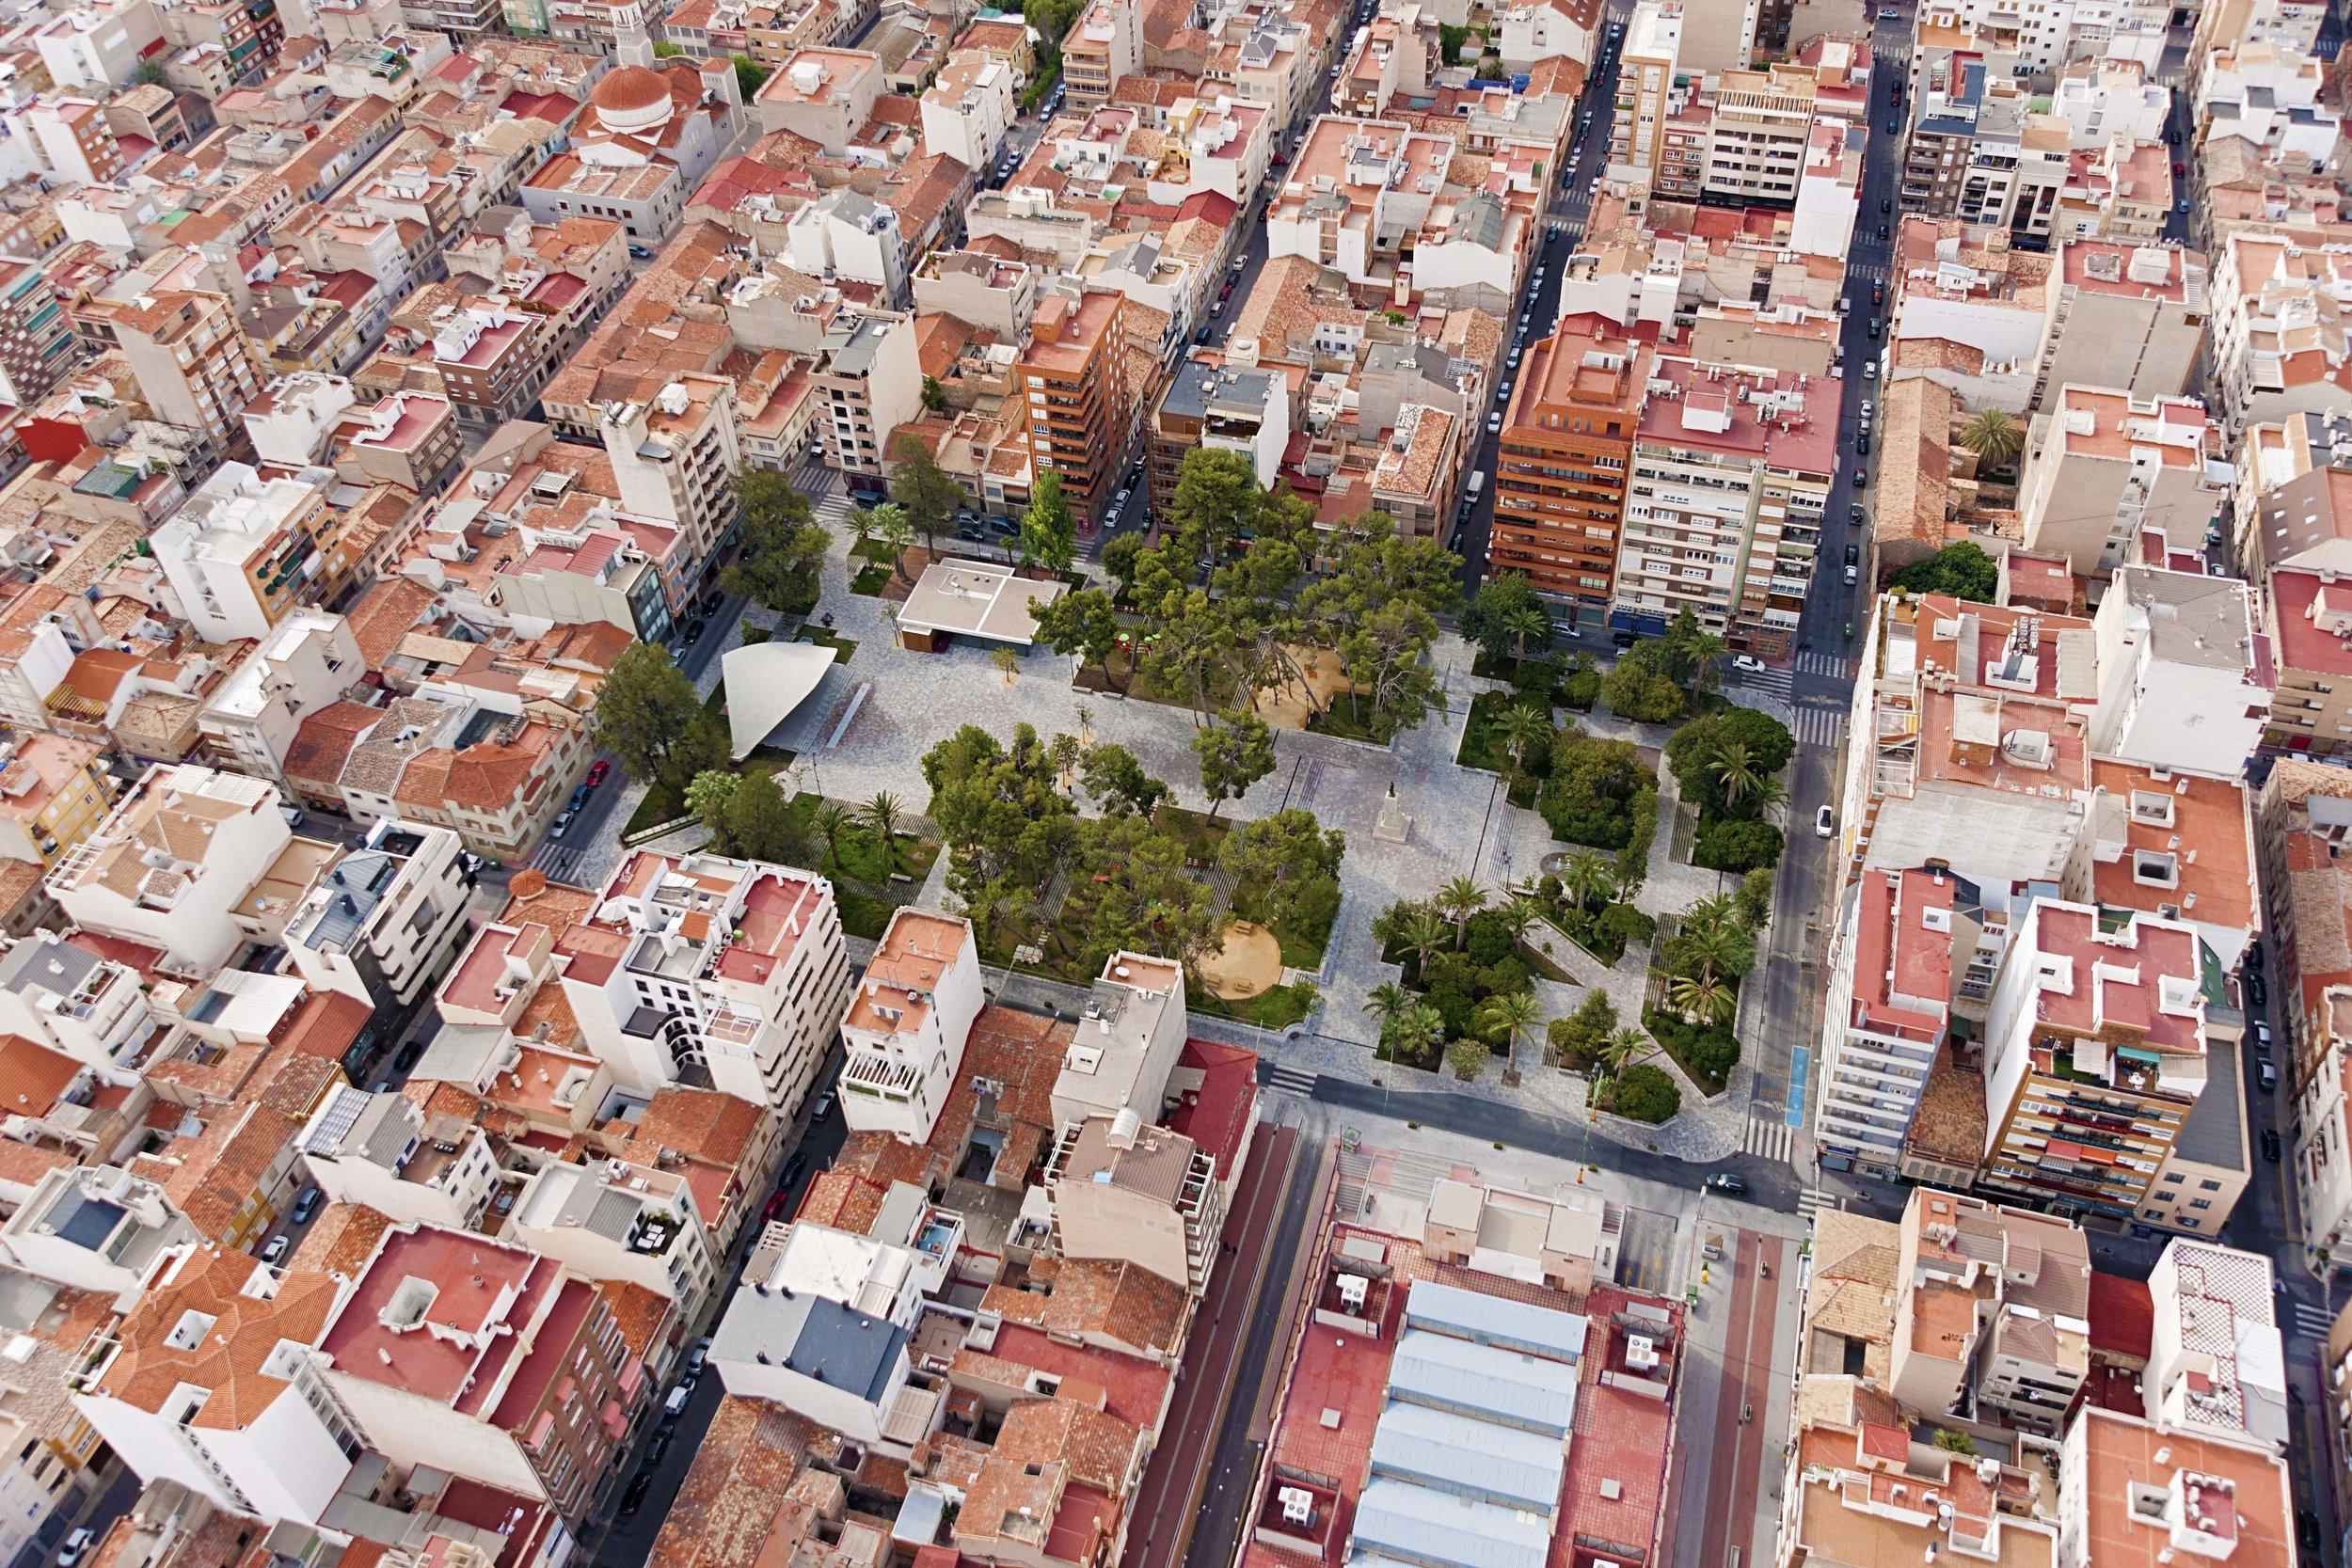 Plaza Castelar